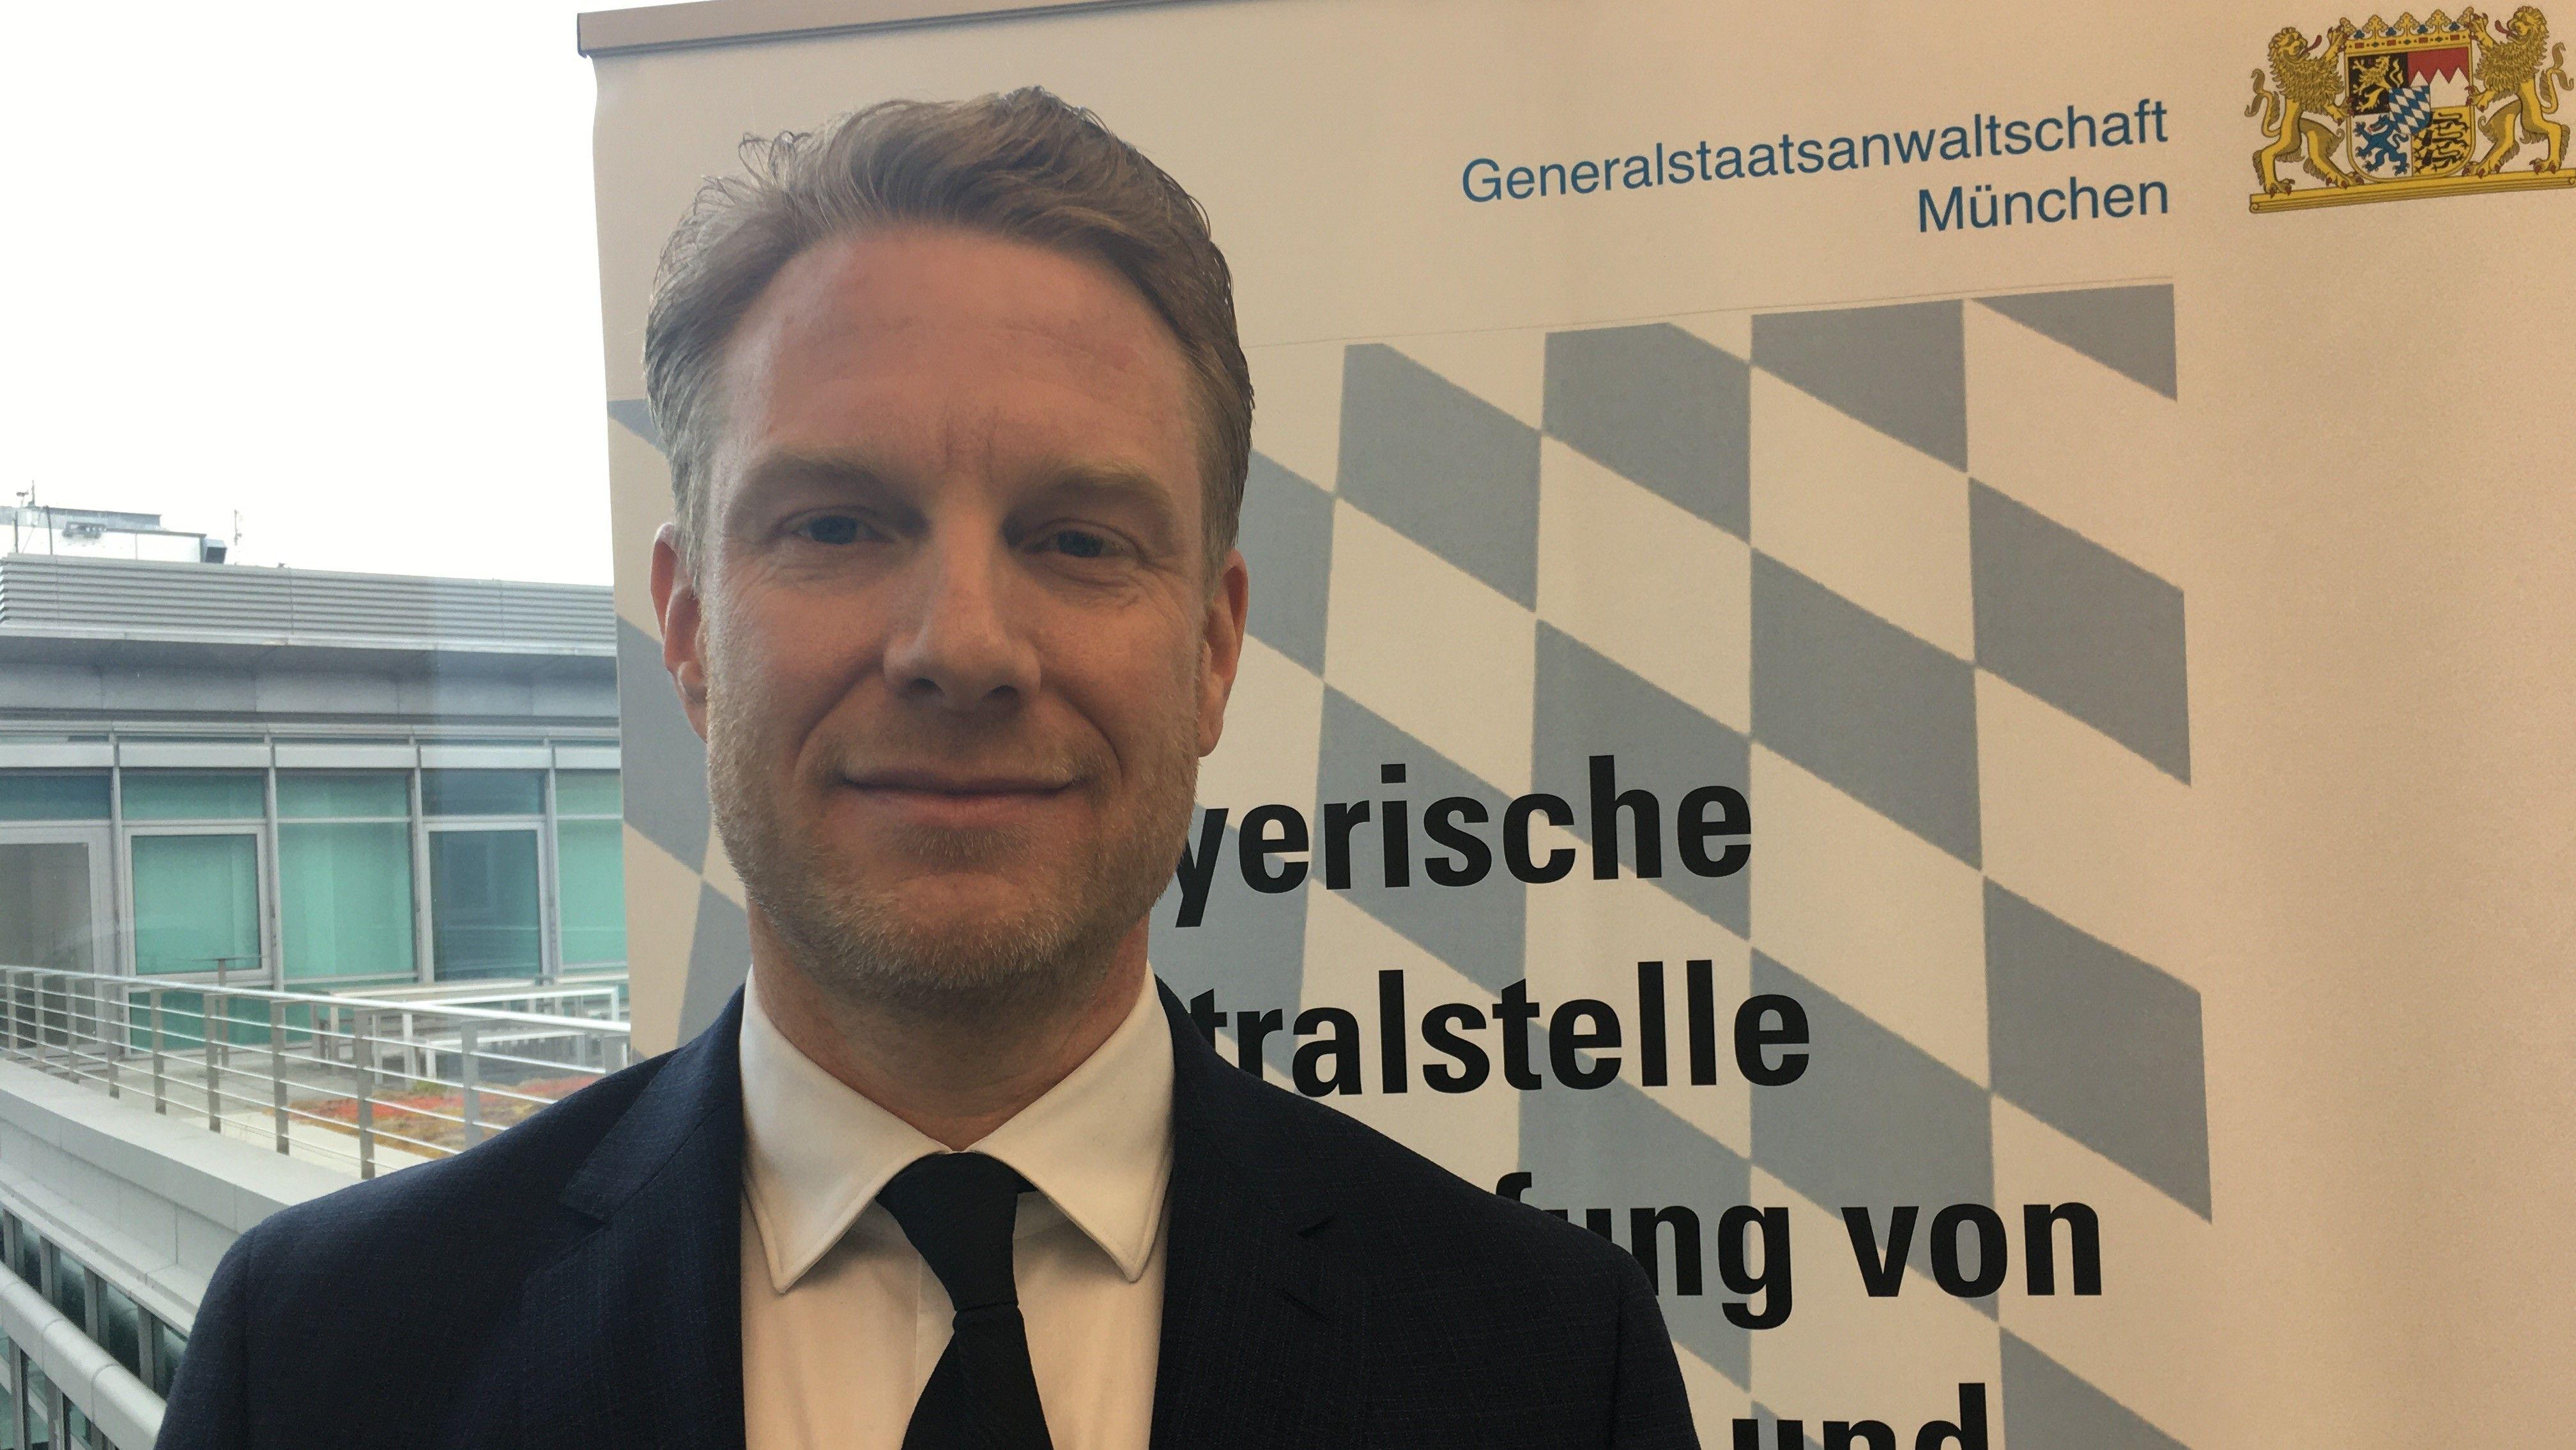 Oberstaatsanwalt Klaus-Dieter Hartleb